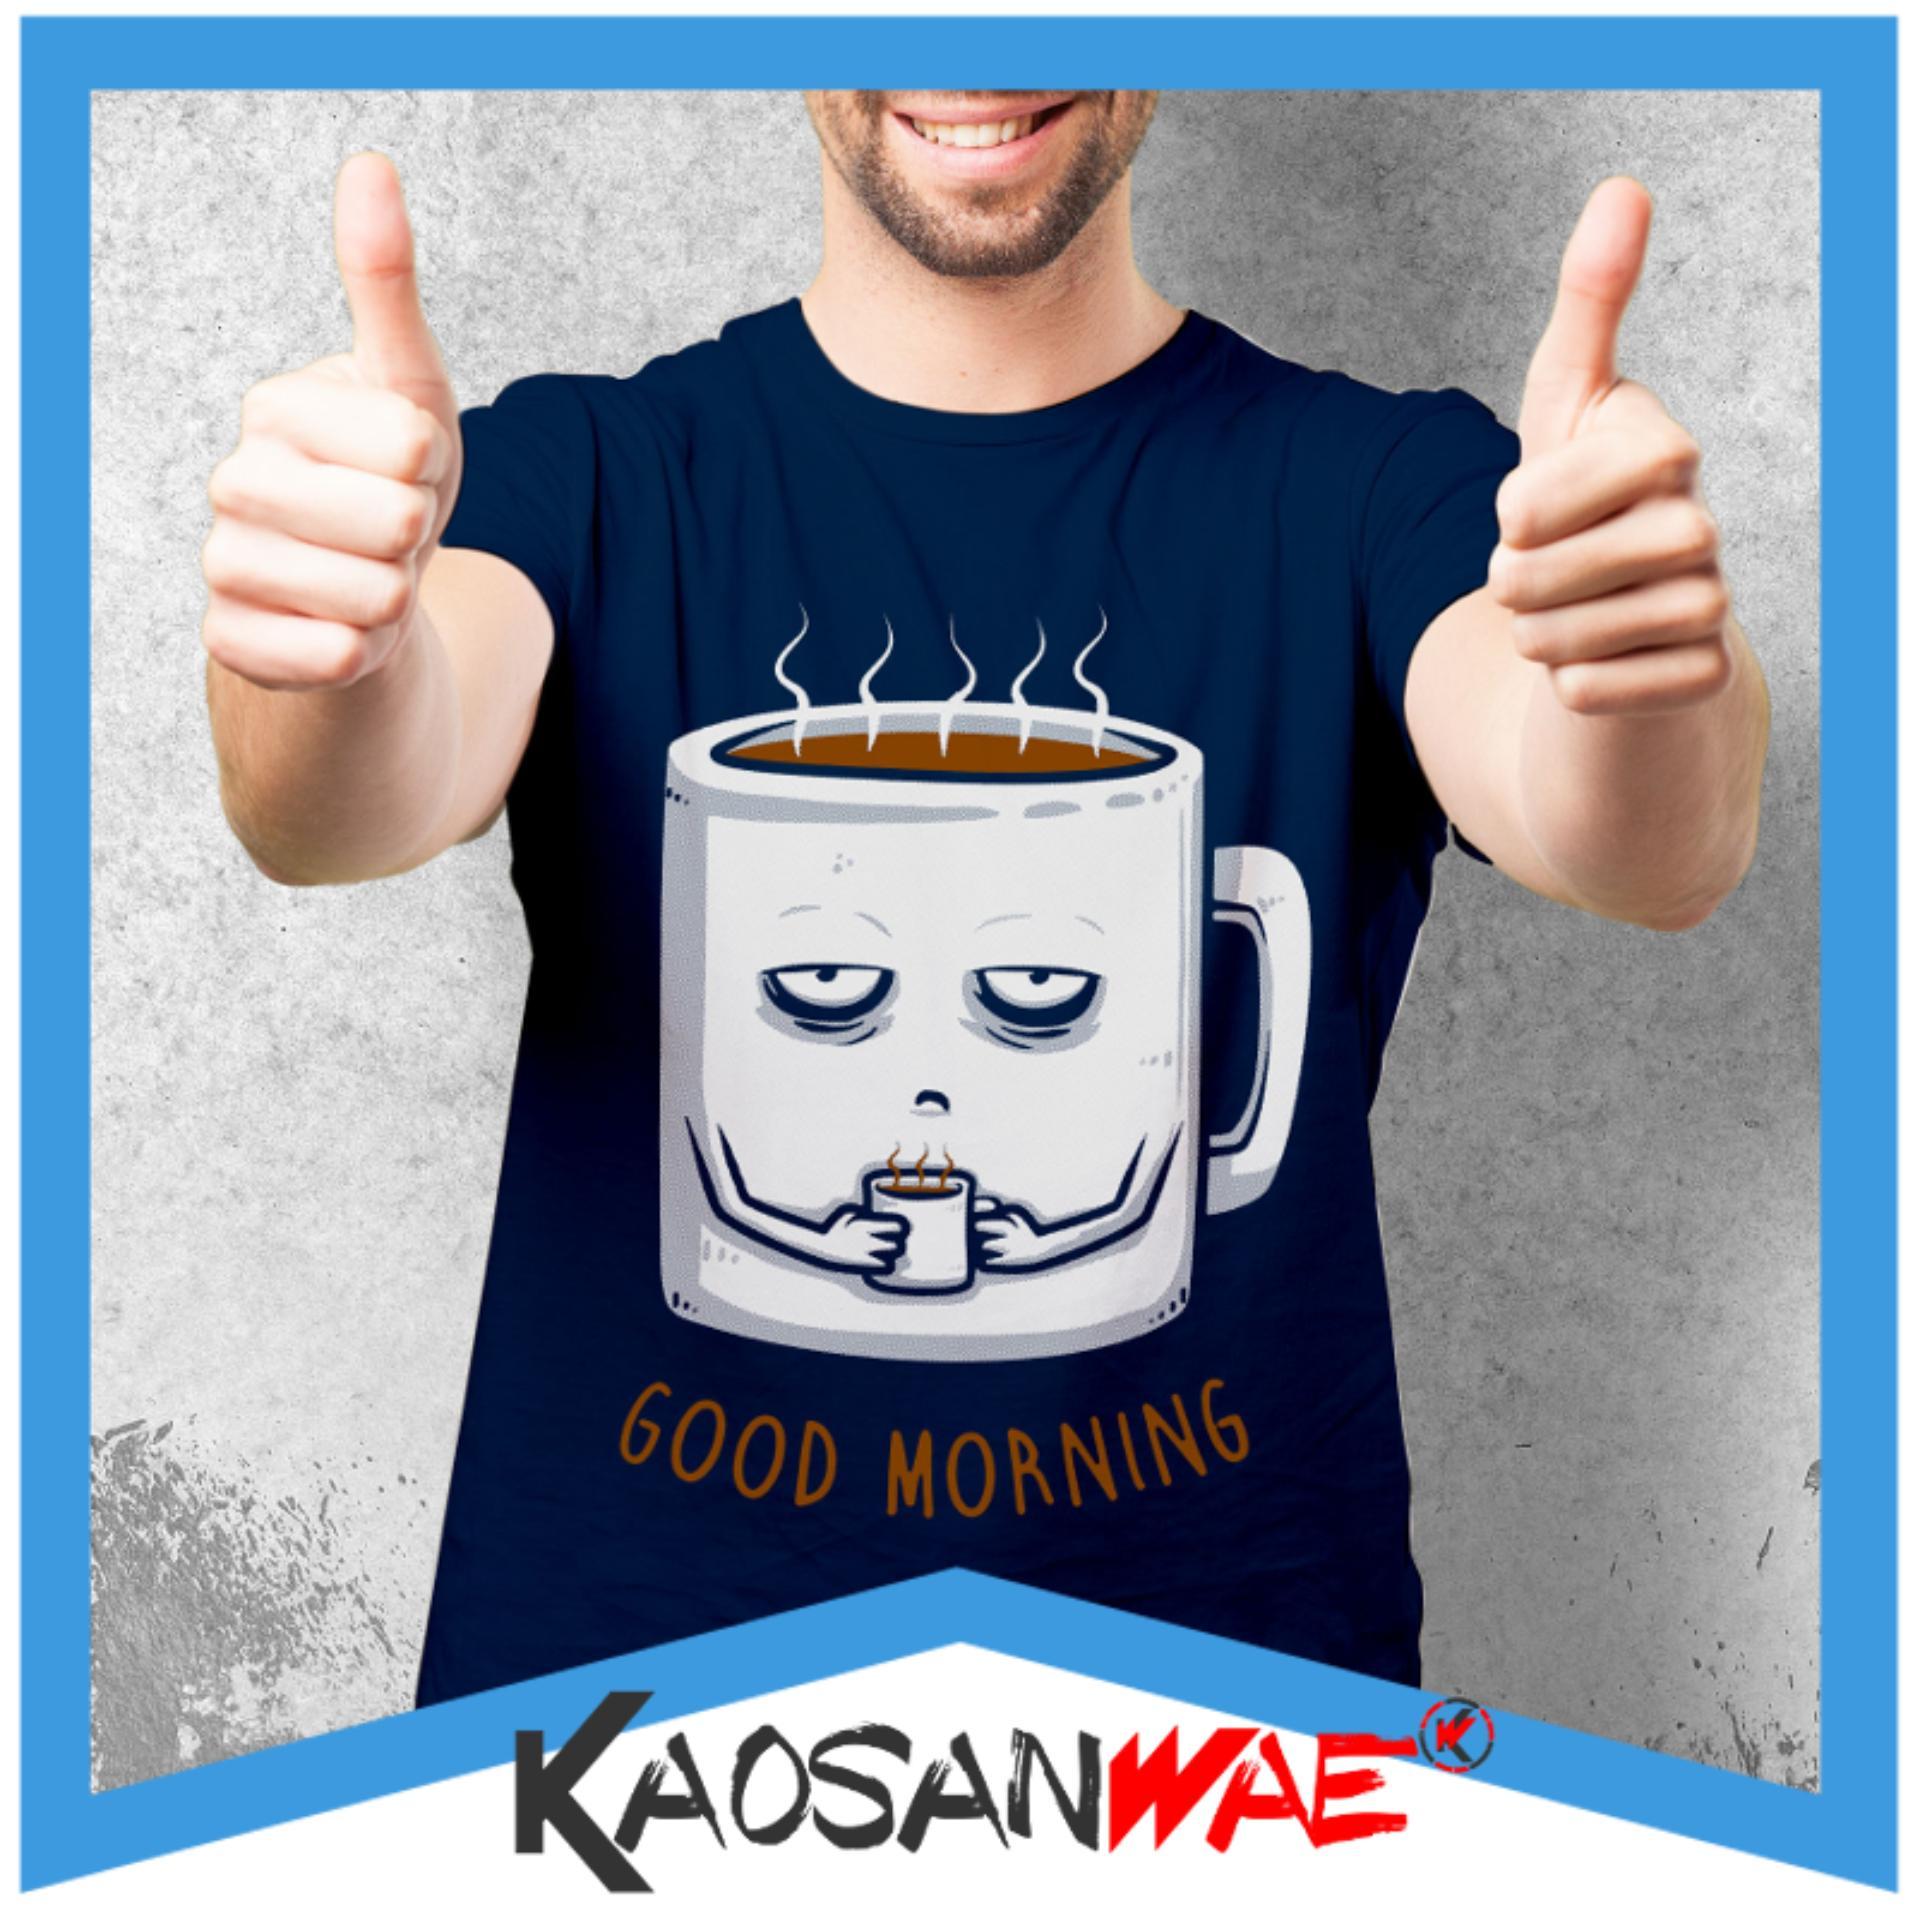 Kehebatan Handuk Good Morning N332 Dan Harga Update Teknologi Kaos Kopi Coffe Tshirt Kaosanwae